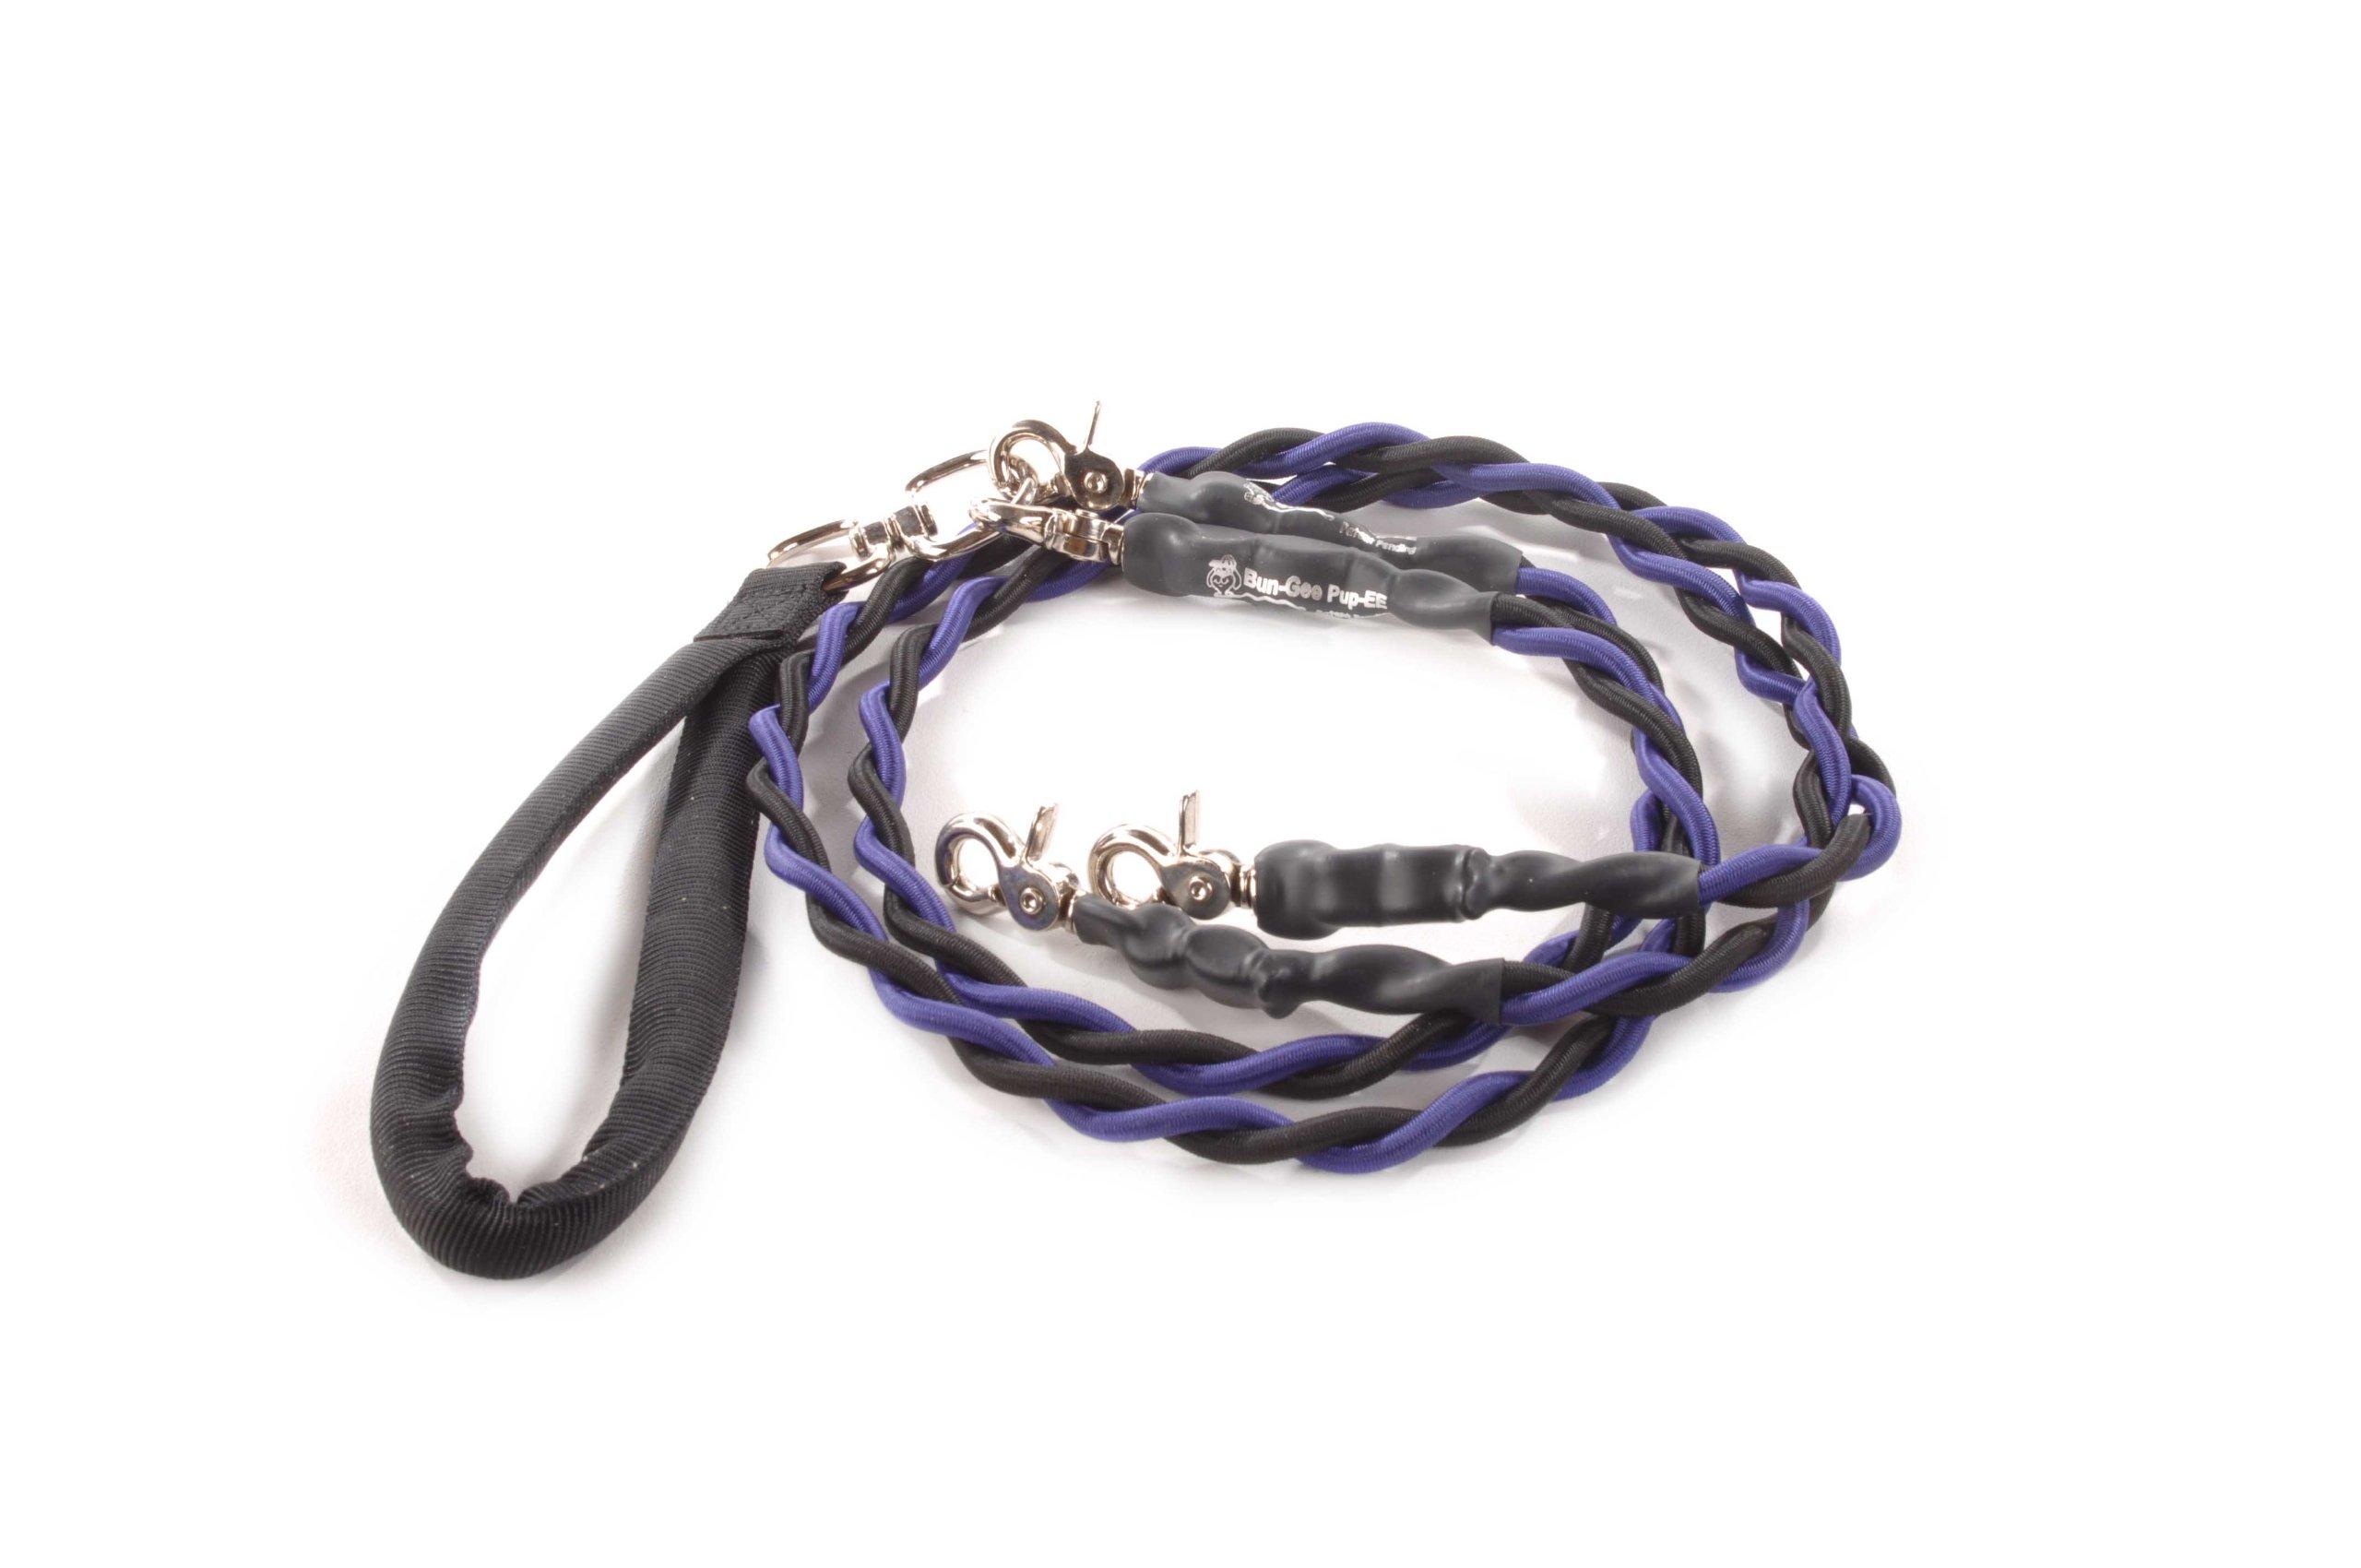 Bungee Pupee 4-Feet Double Pet Leash for Medium Sized Dogs, Purple/Black